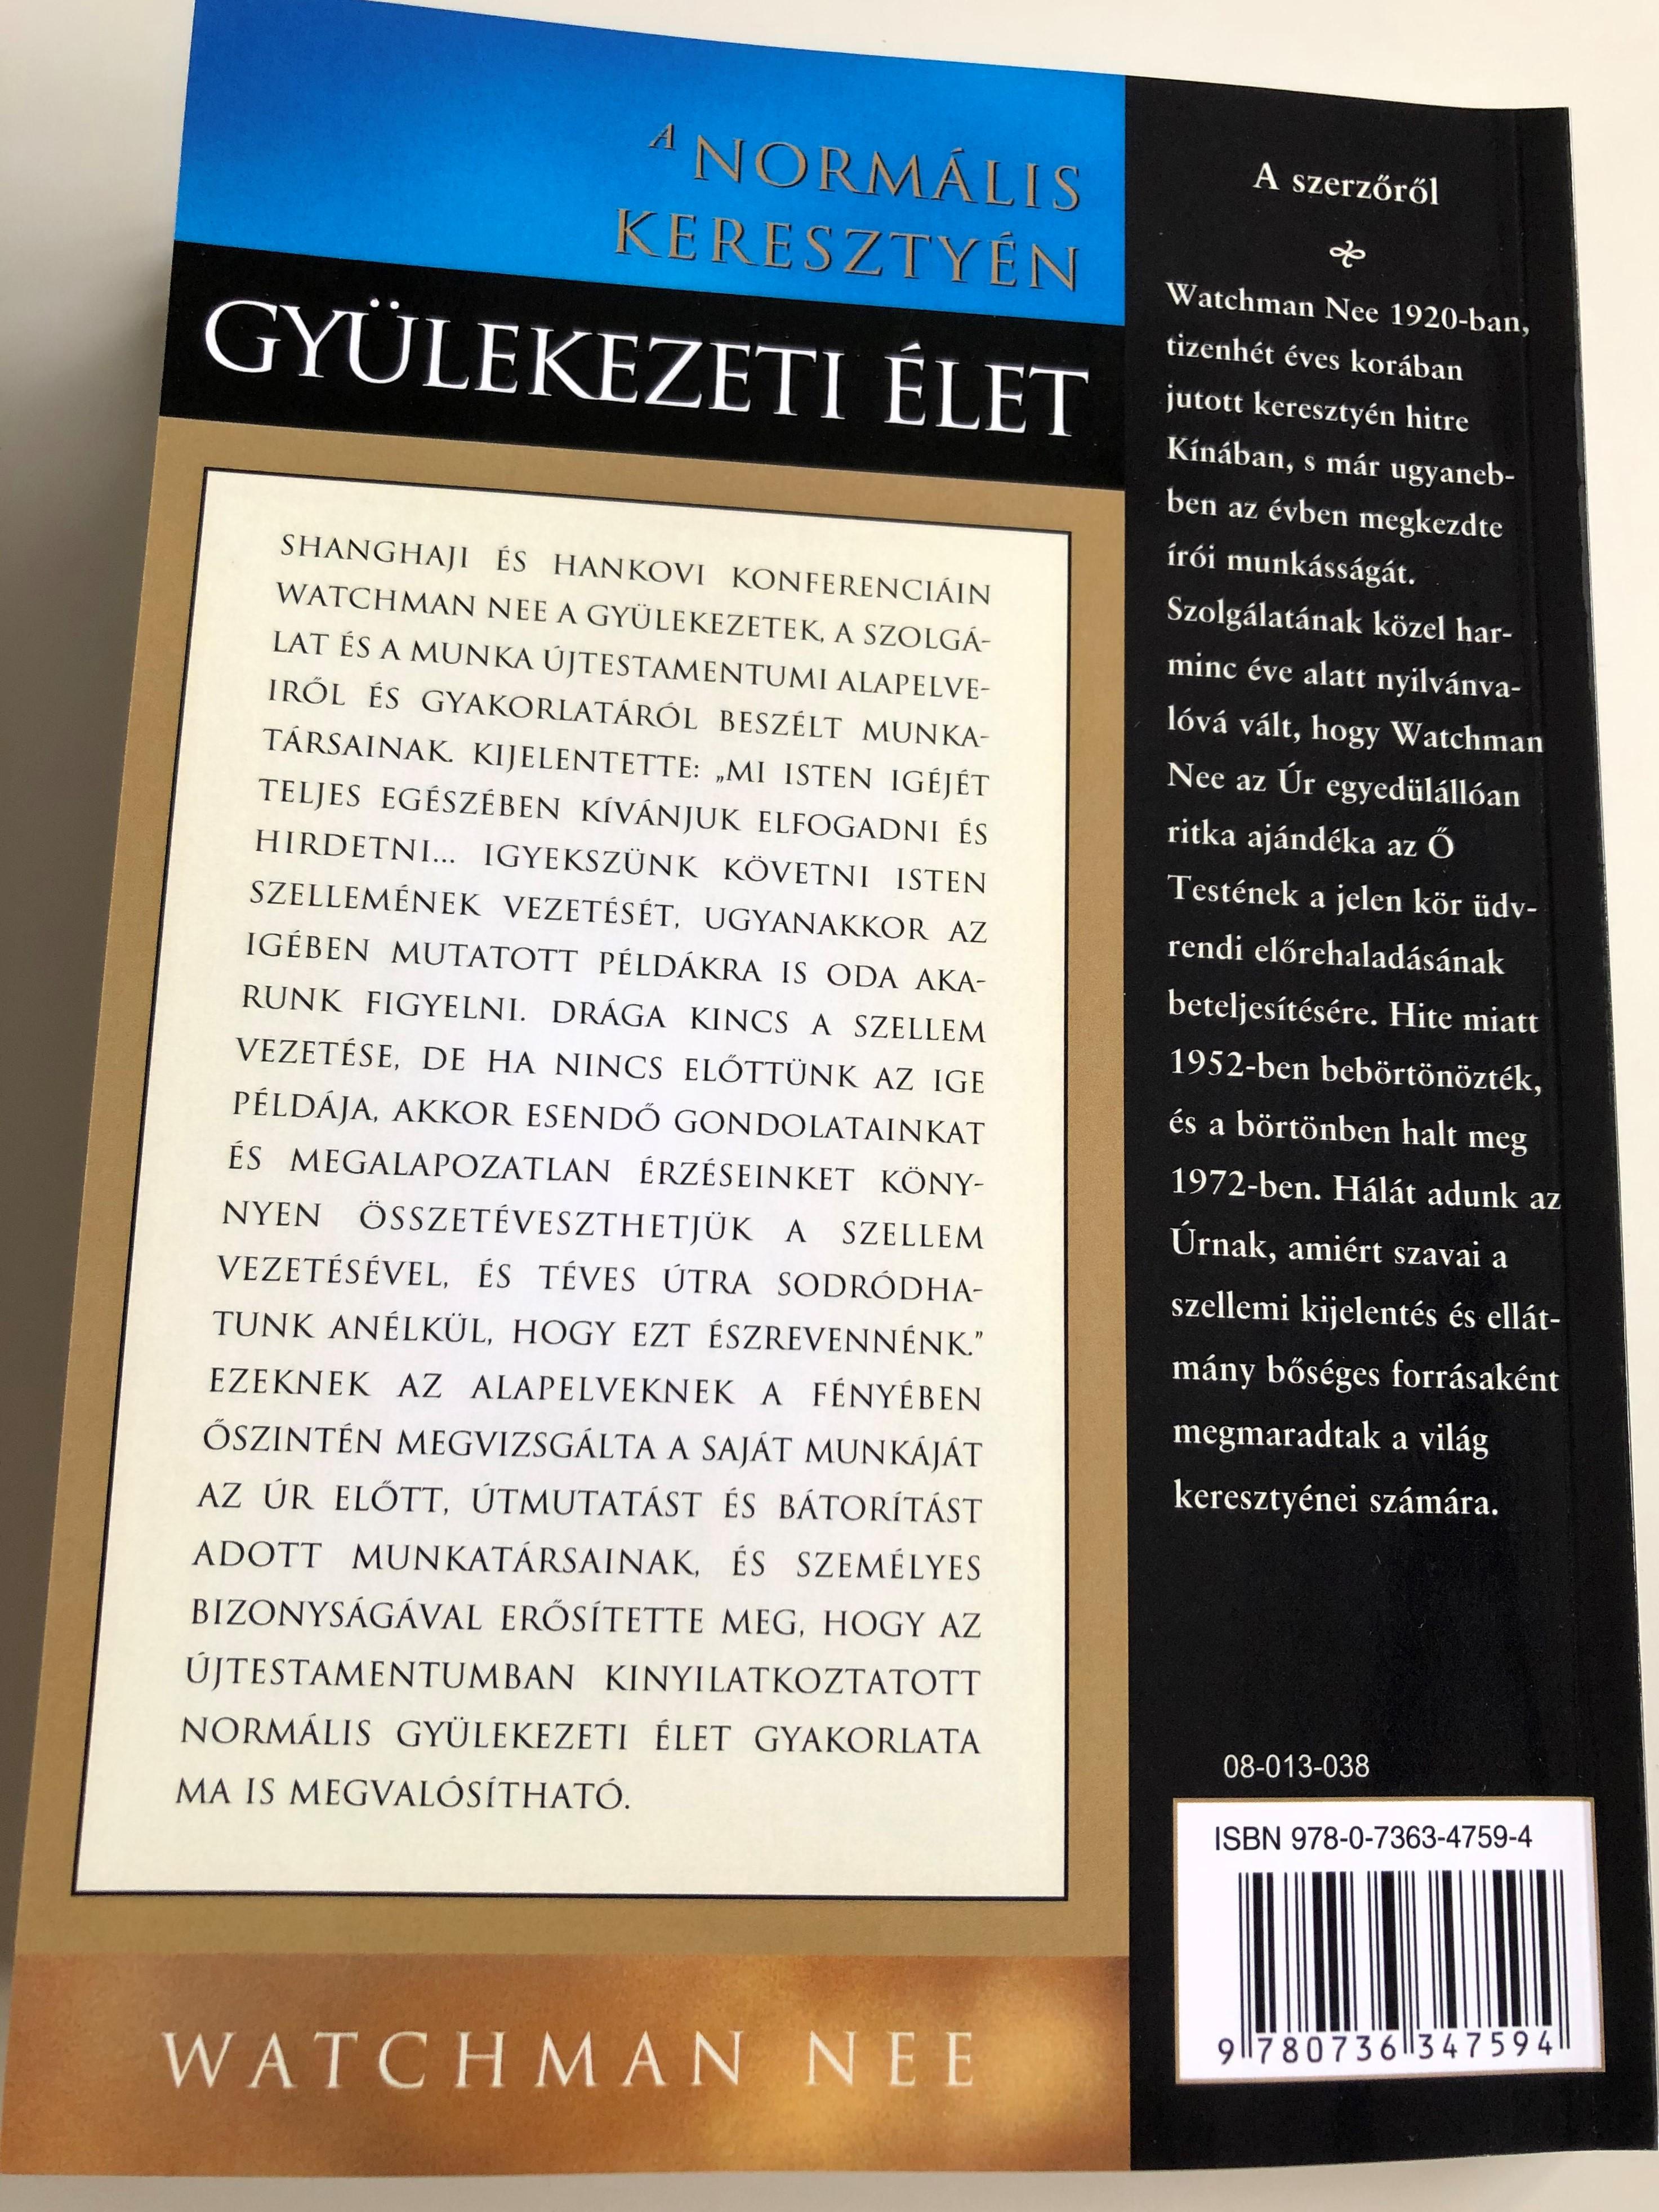 a-norm-lis-kereszty-n-gy-lekezeti-let-by-watchman-nee-the-normal-christian-church-life-in-hungarian-language-9.jpg